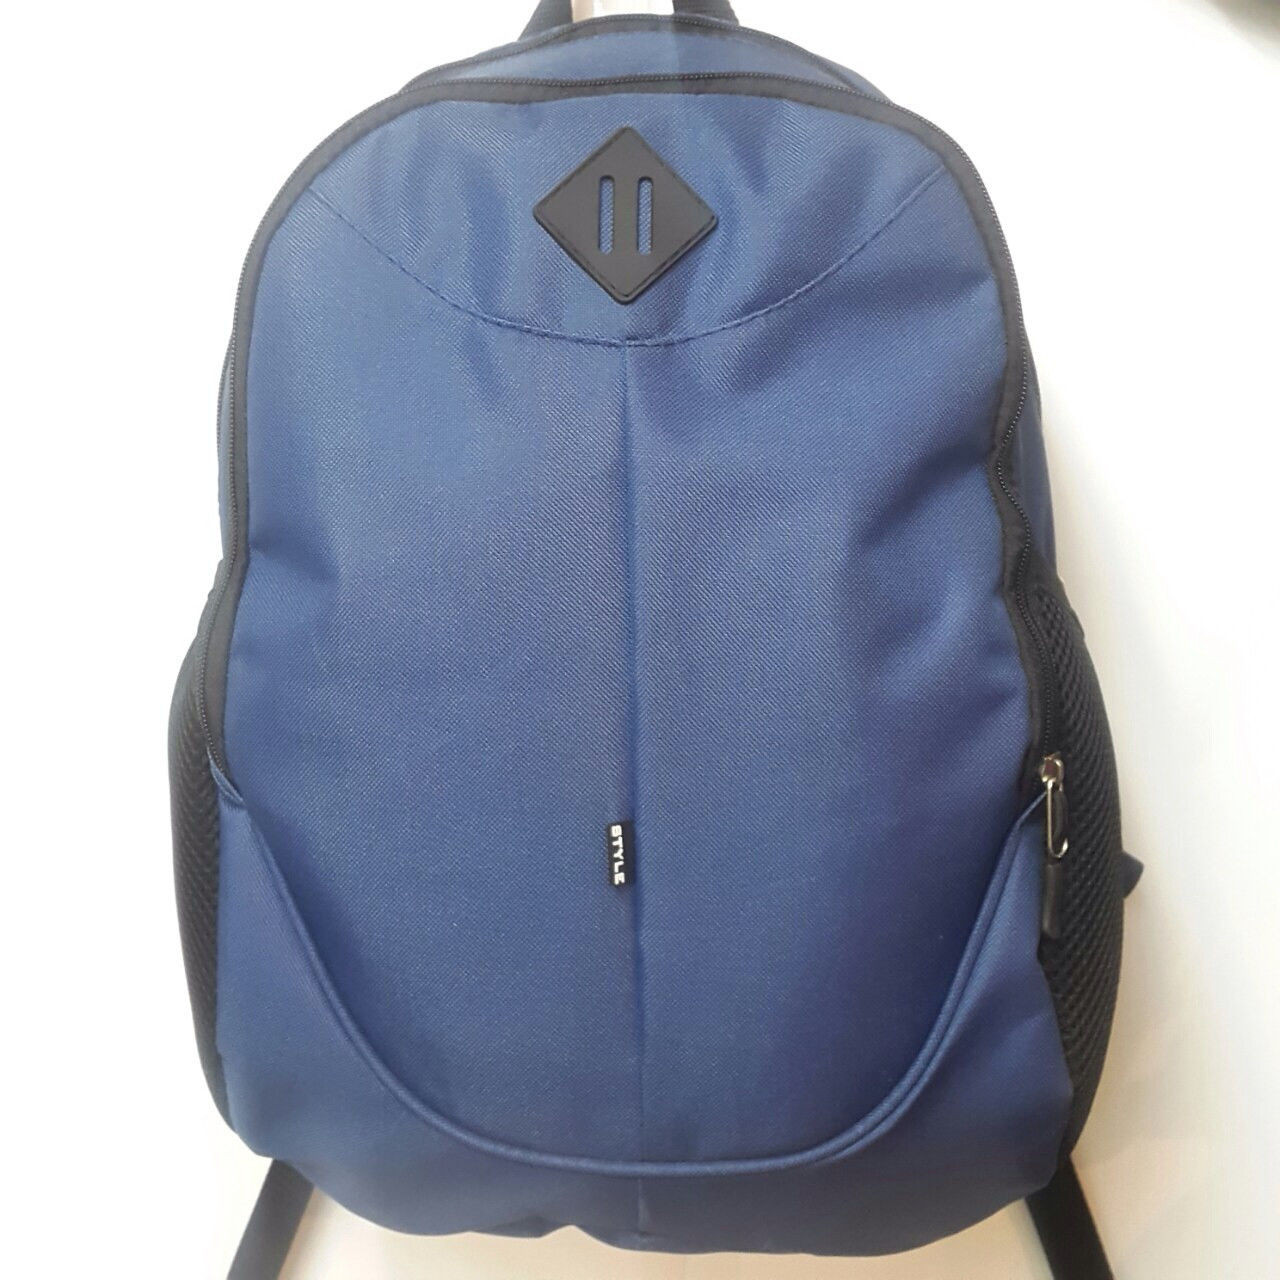 Рюкзак молодежный Ромб UKsport, Укрспорт темно-синий